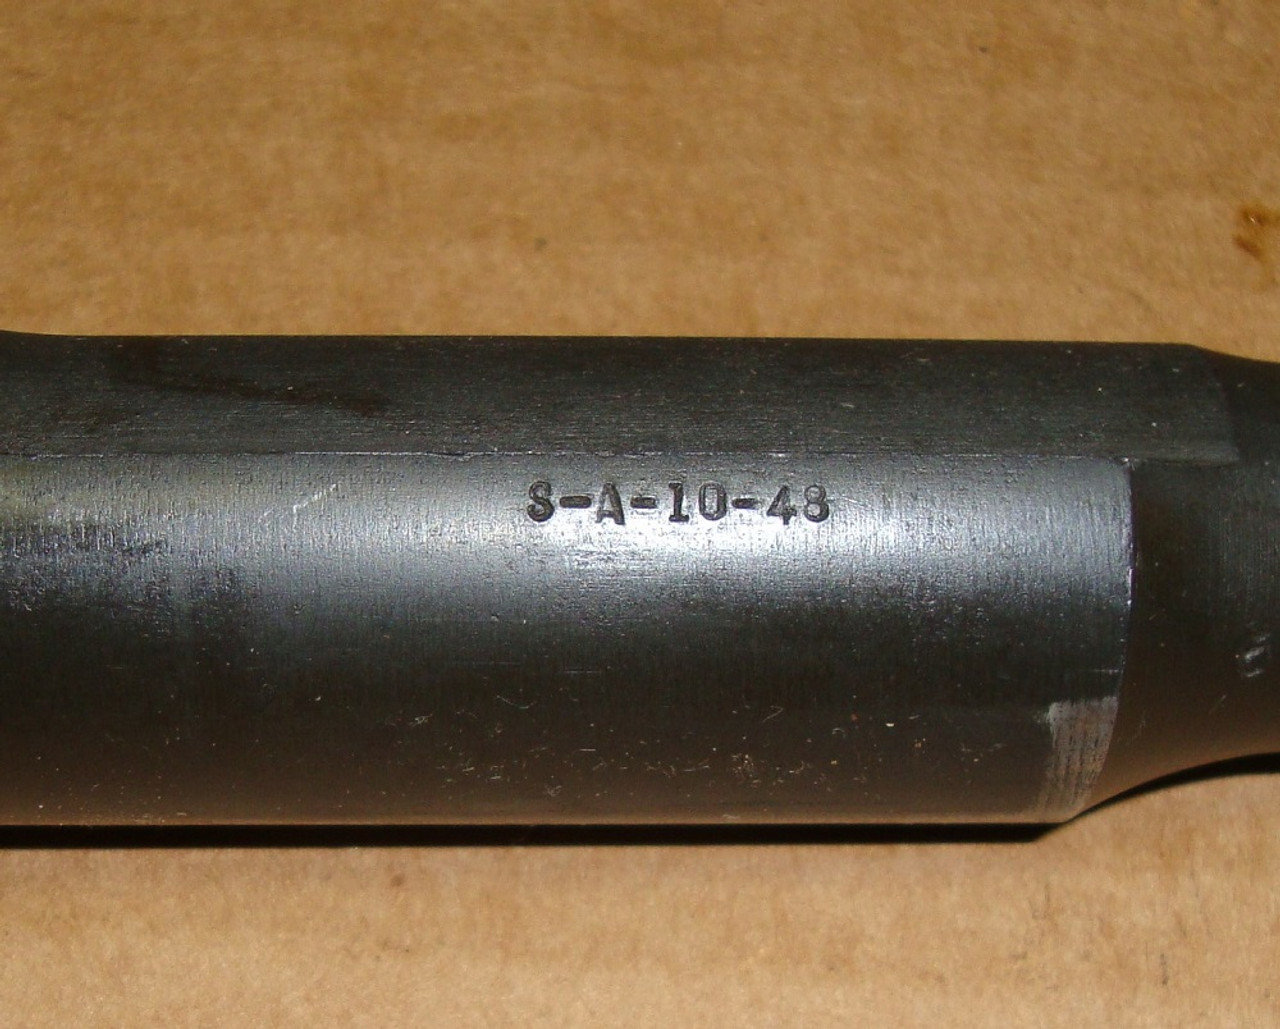 M1 Garand Barrel Springfield Oct 1948 <br>ME 0.1  TE 1.8